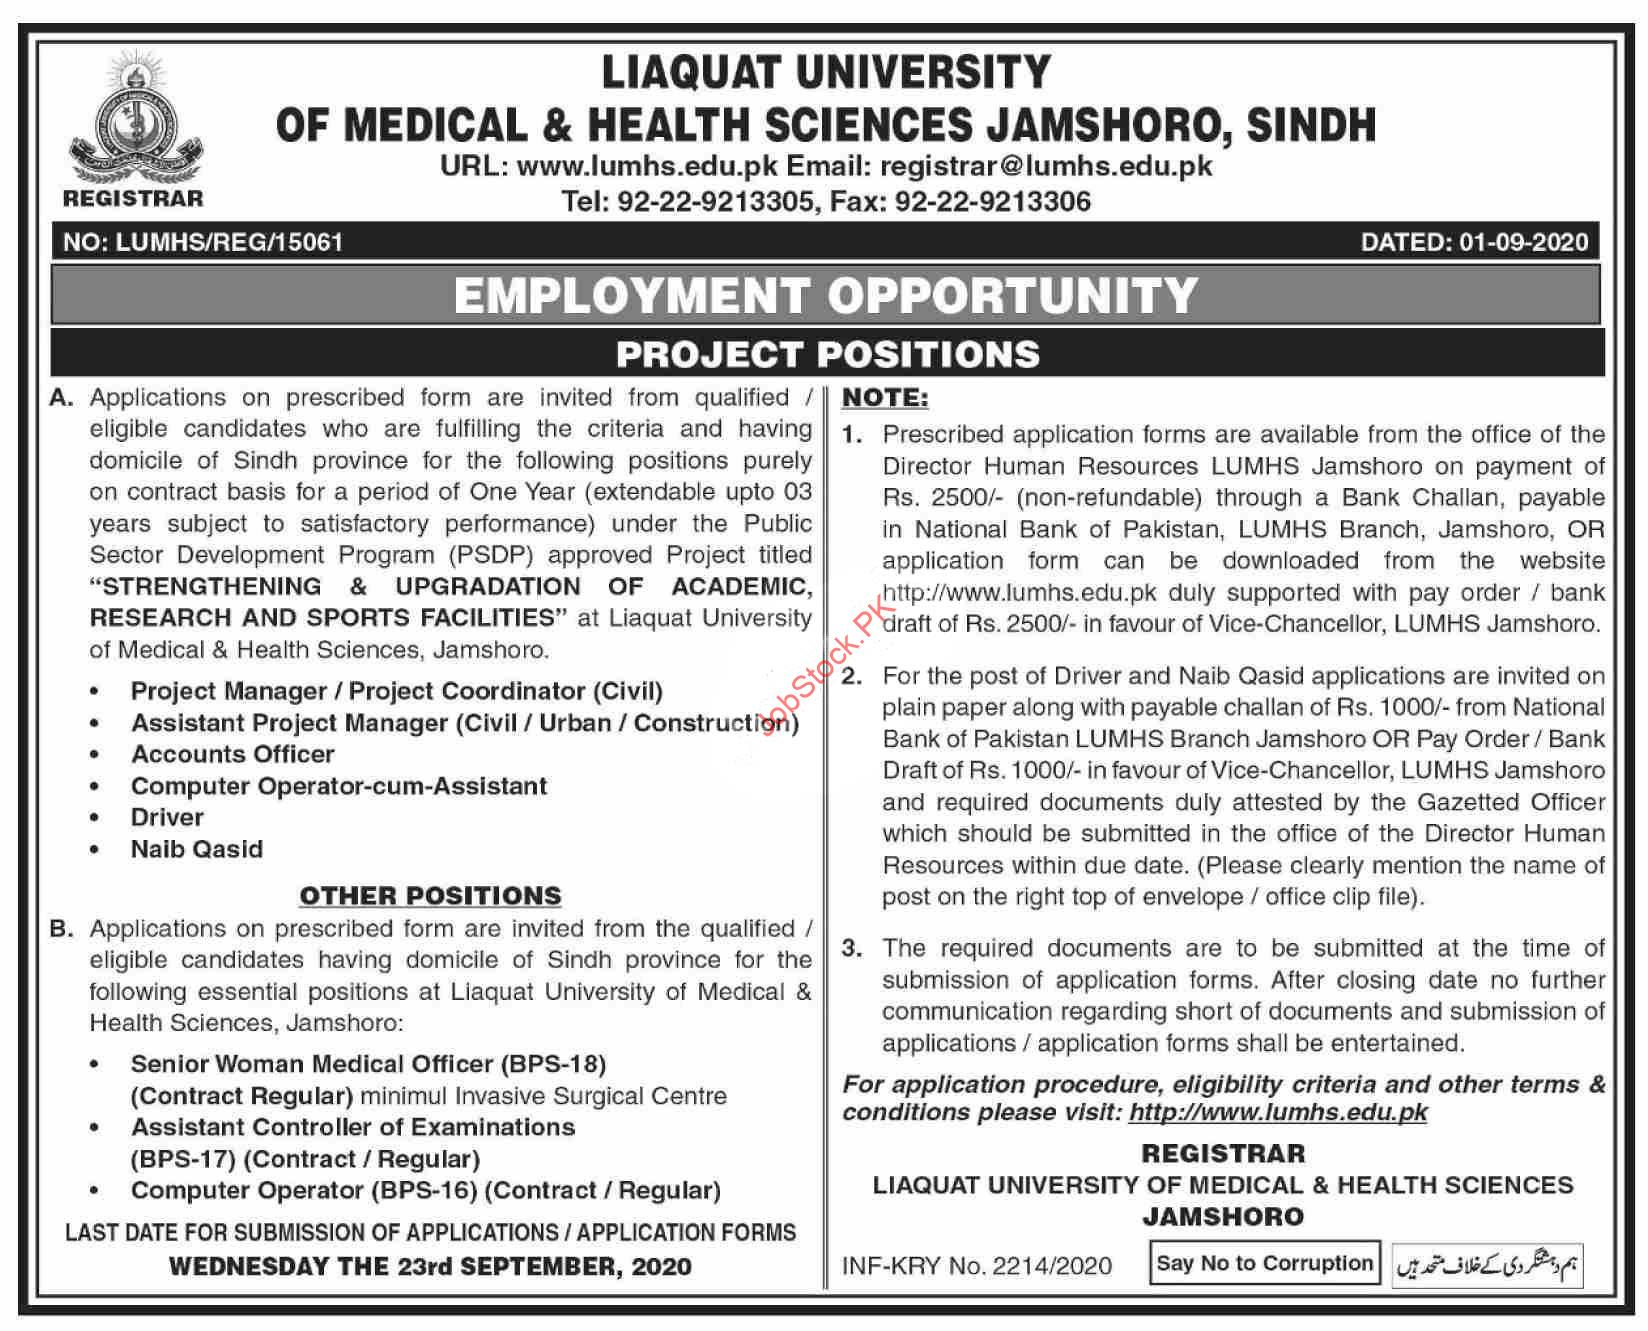 Liaquat University Of Medical & Health Sciences Lumhs Jamshoro Jobs 2020